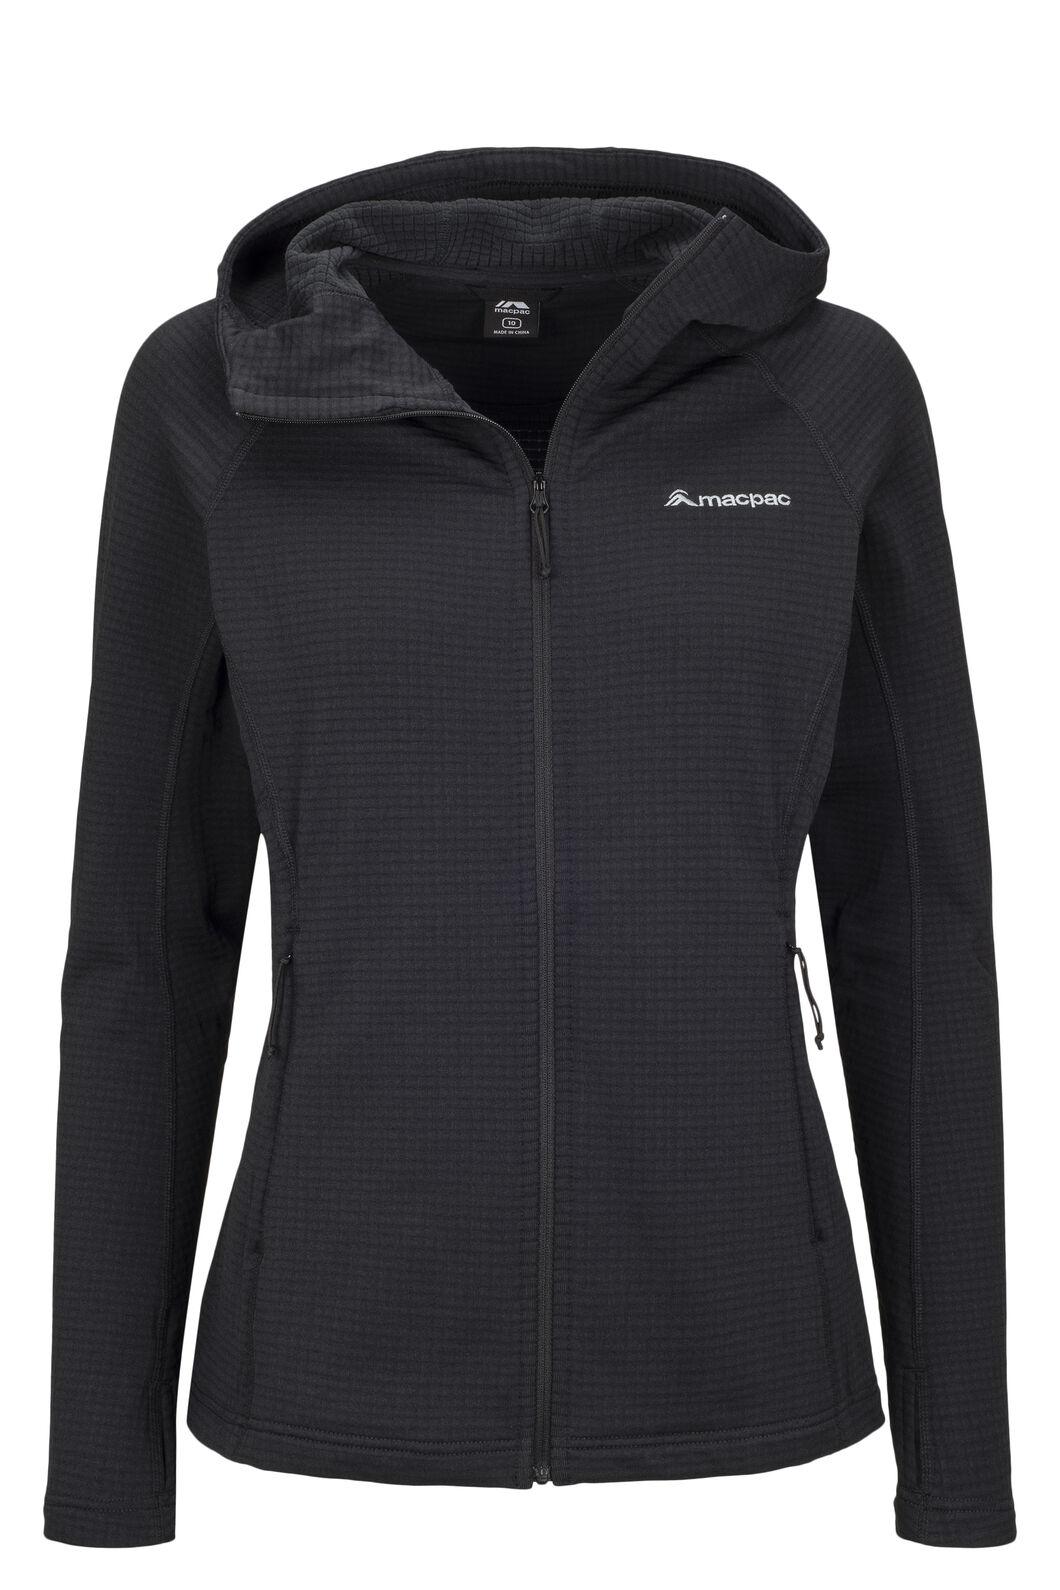 Macpac Women's Ion Polartec® Fleece Hooded Jacket, Black, hi-res